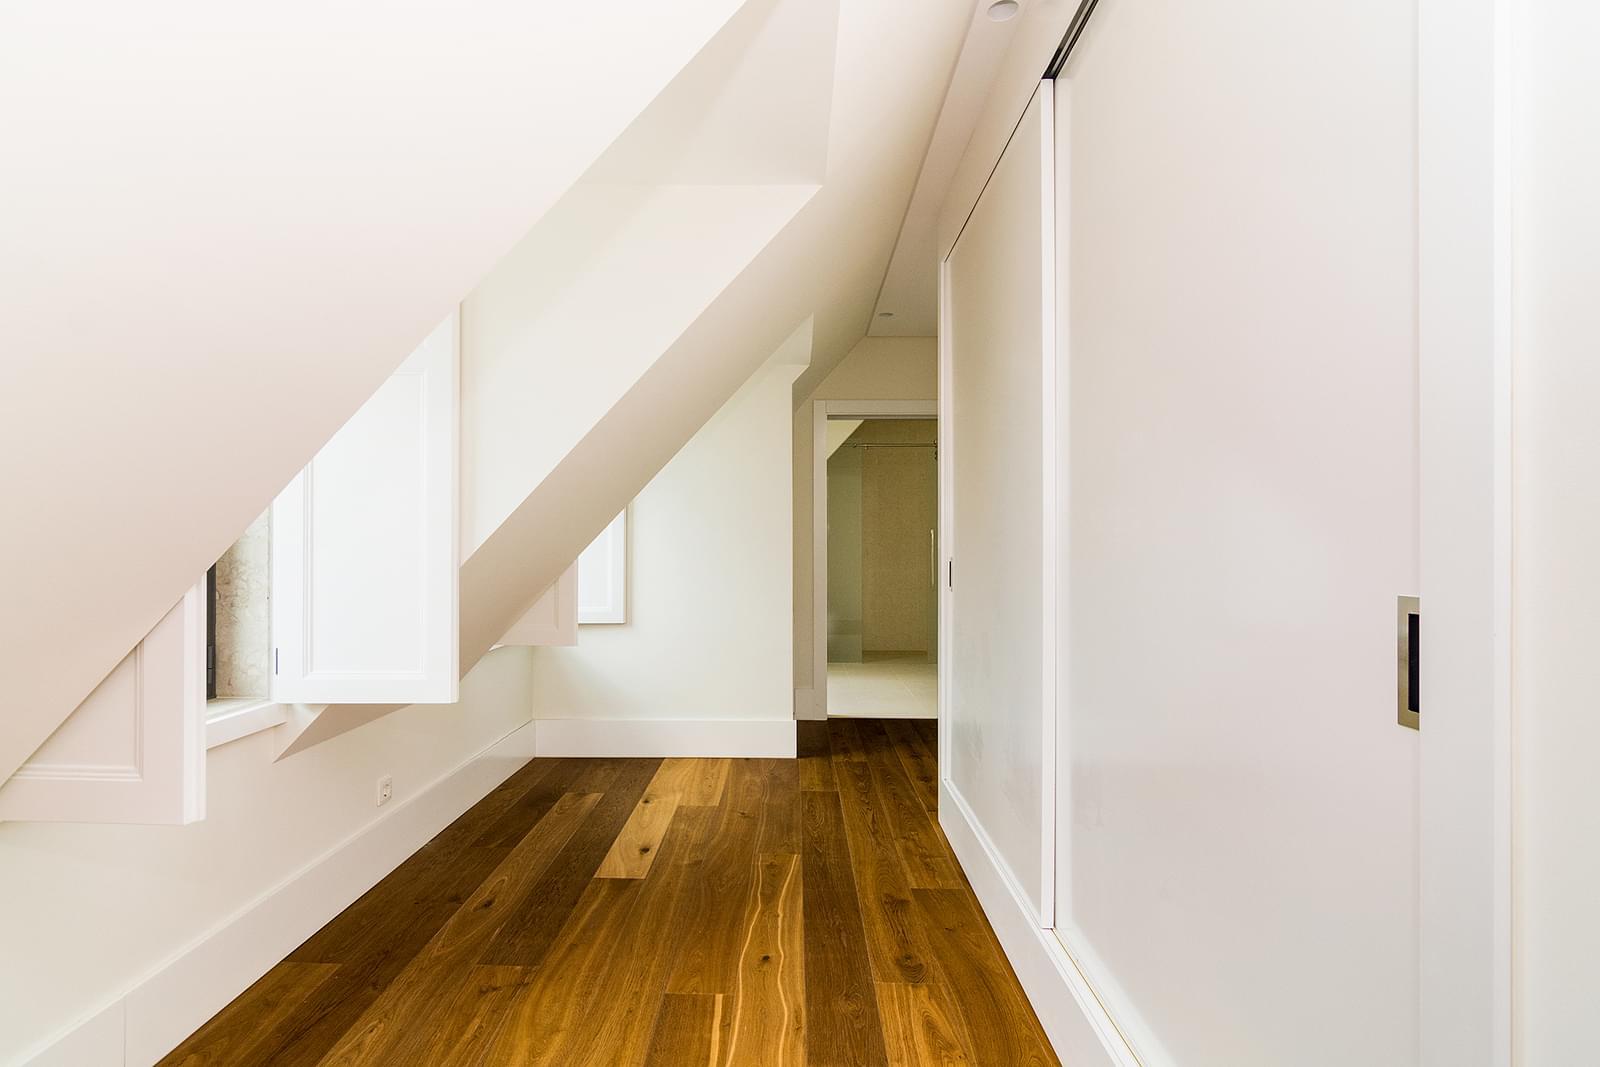 pf17442-apartamento-t3-lisboa-adaa262e-3da1-4513-9b71-3b8fef21a597